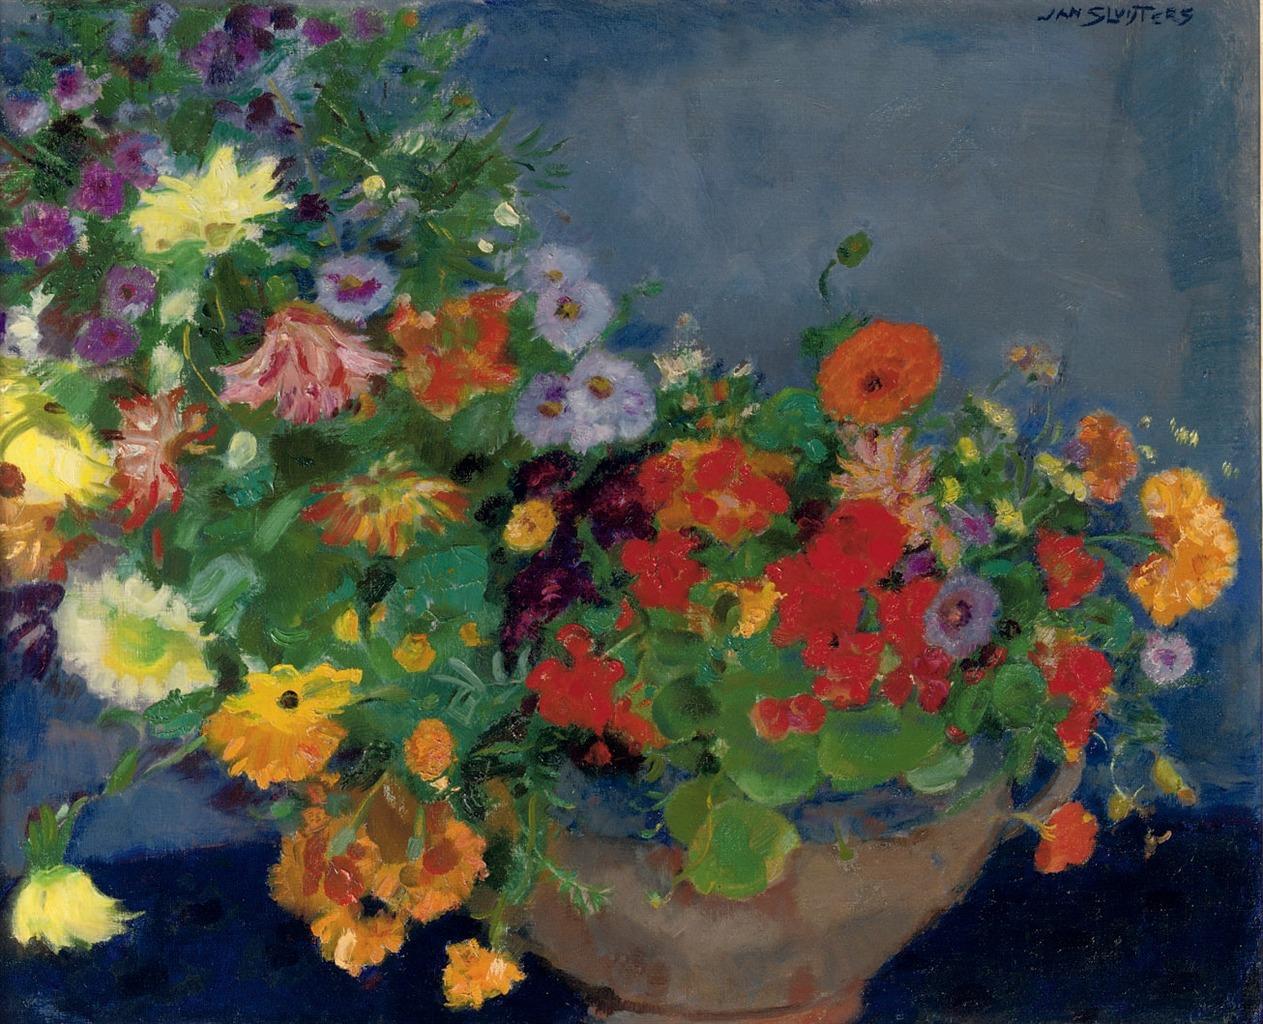 thunderstruck9: Jan Sluijters (Dutch, 1881-1957), Colourful flowers. Oil on canvas, 60 x 72.5 cm.